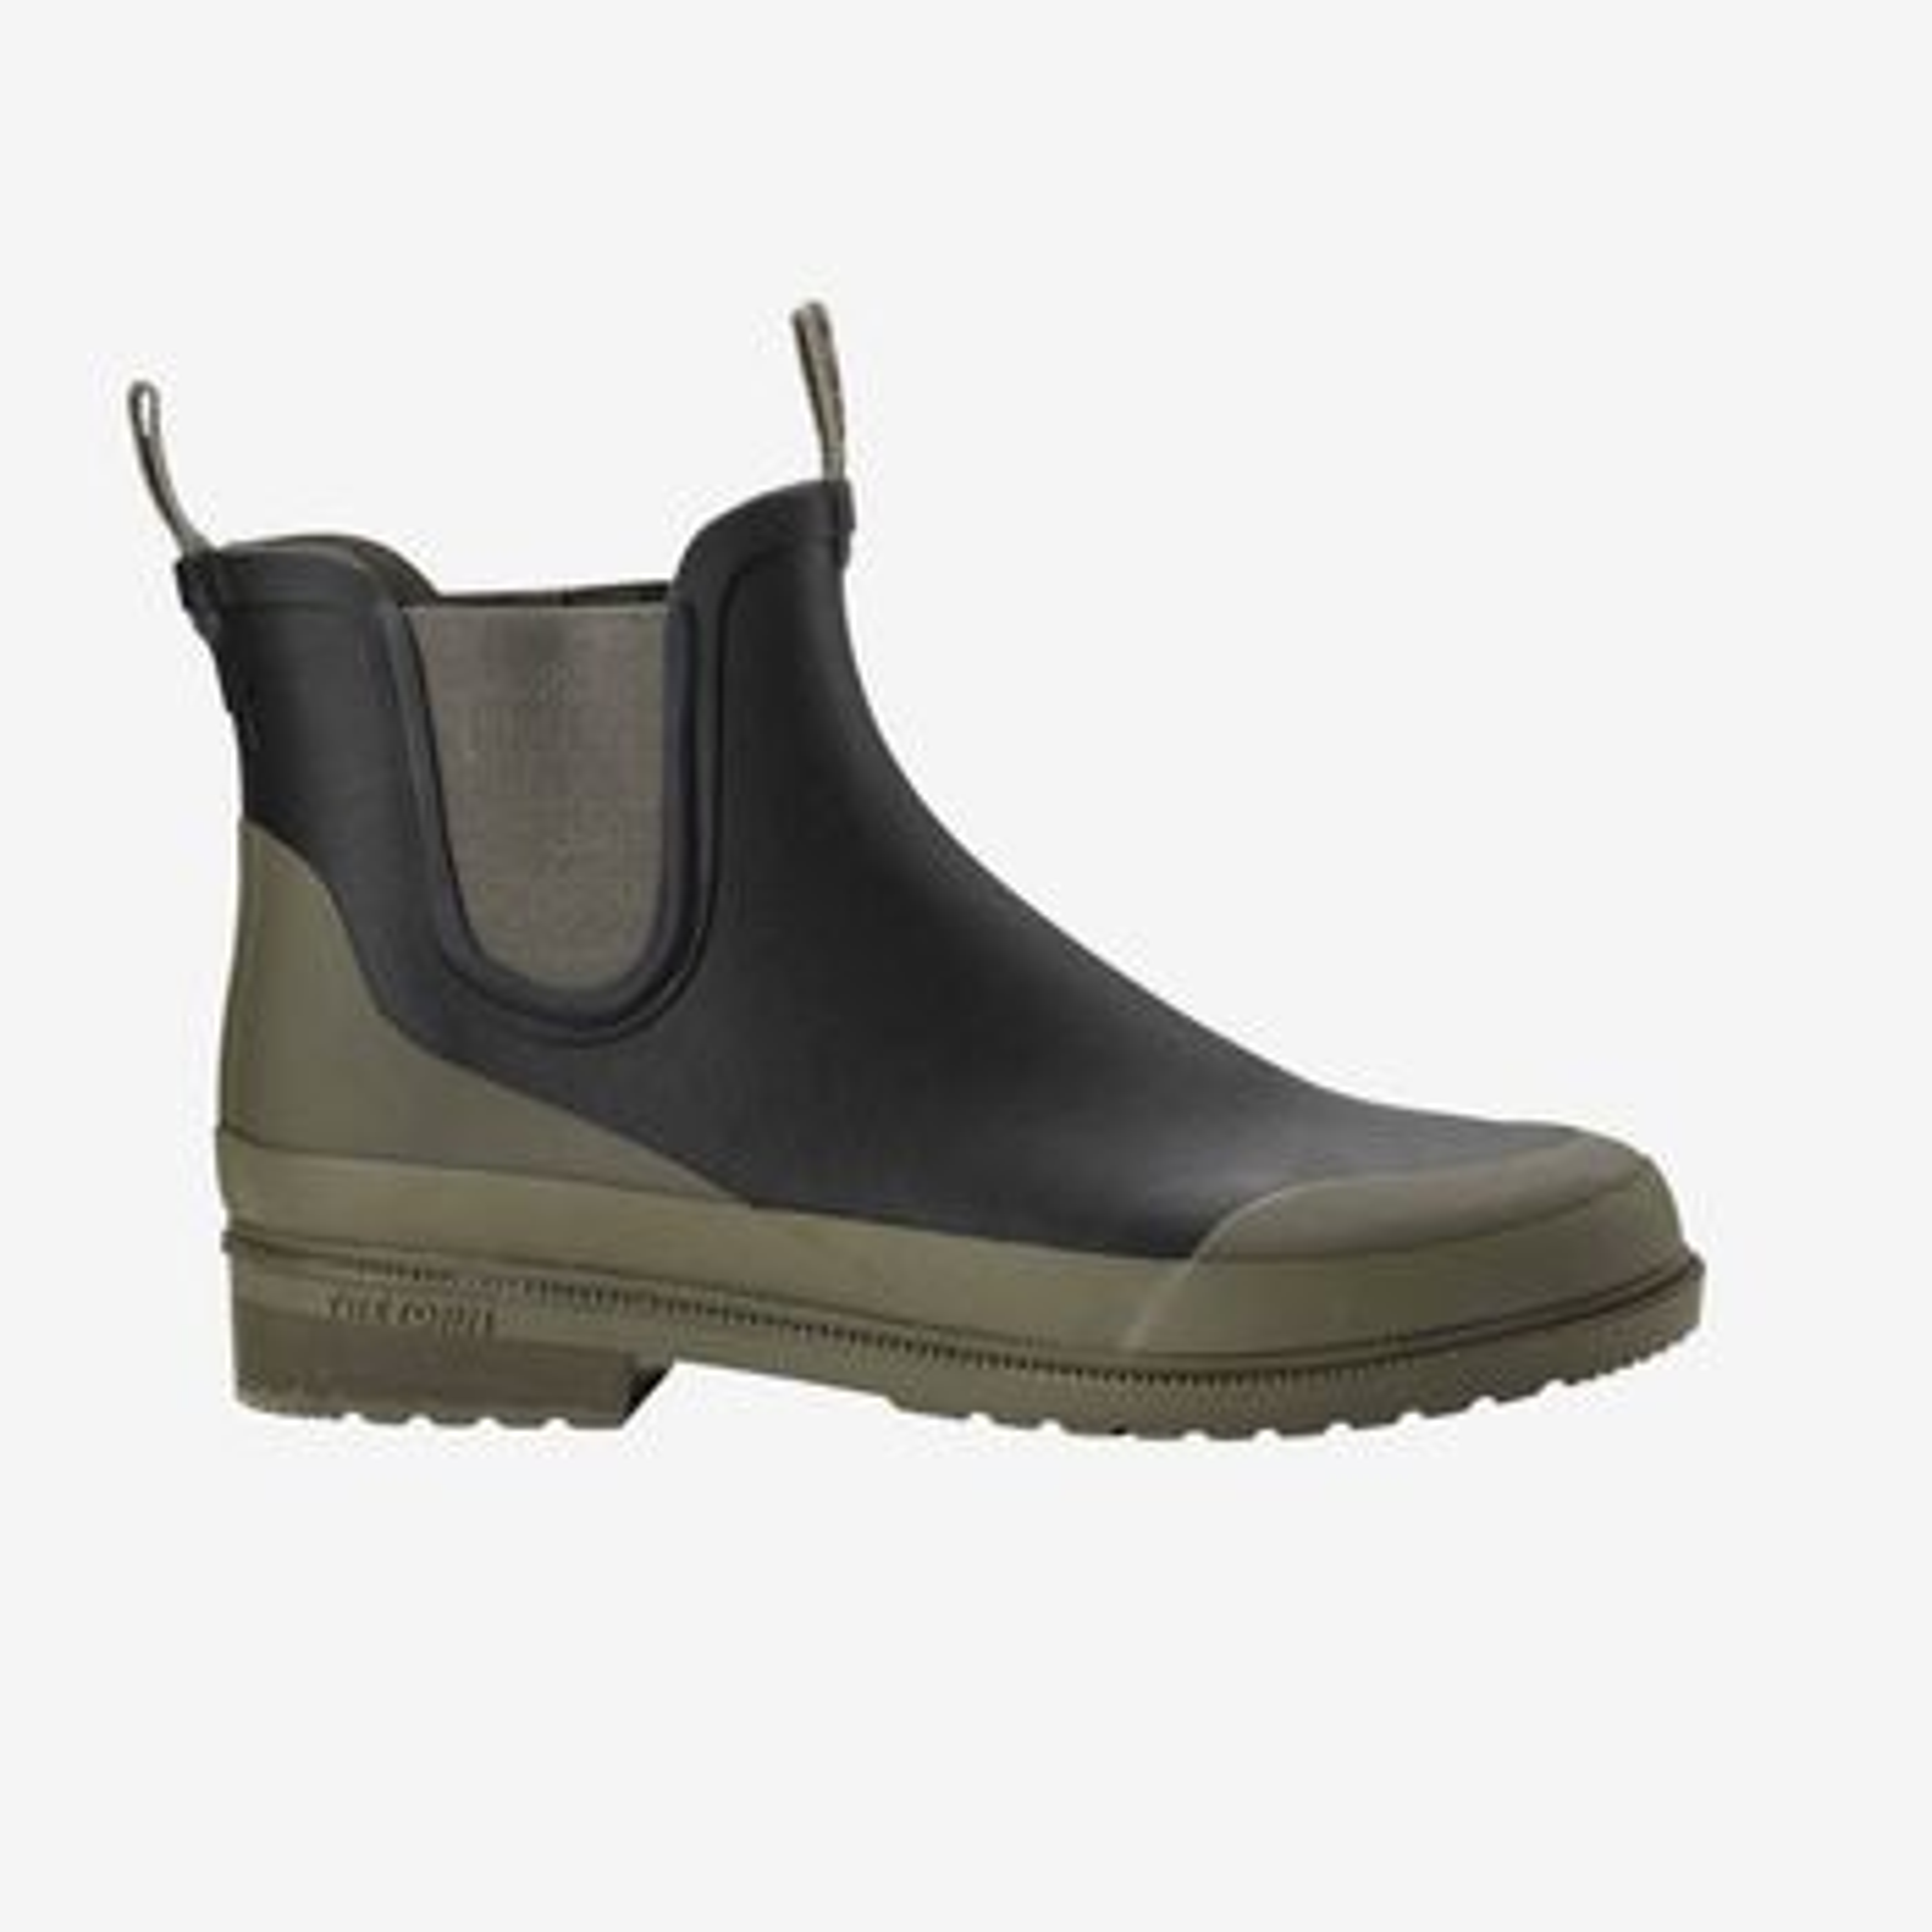 Tretorn Black Green Rubber Offroad Chelsea Boots Side